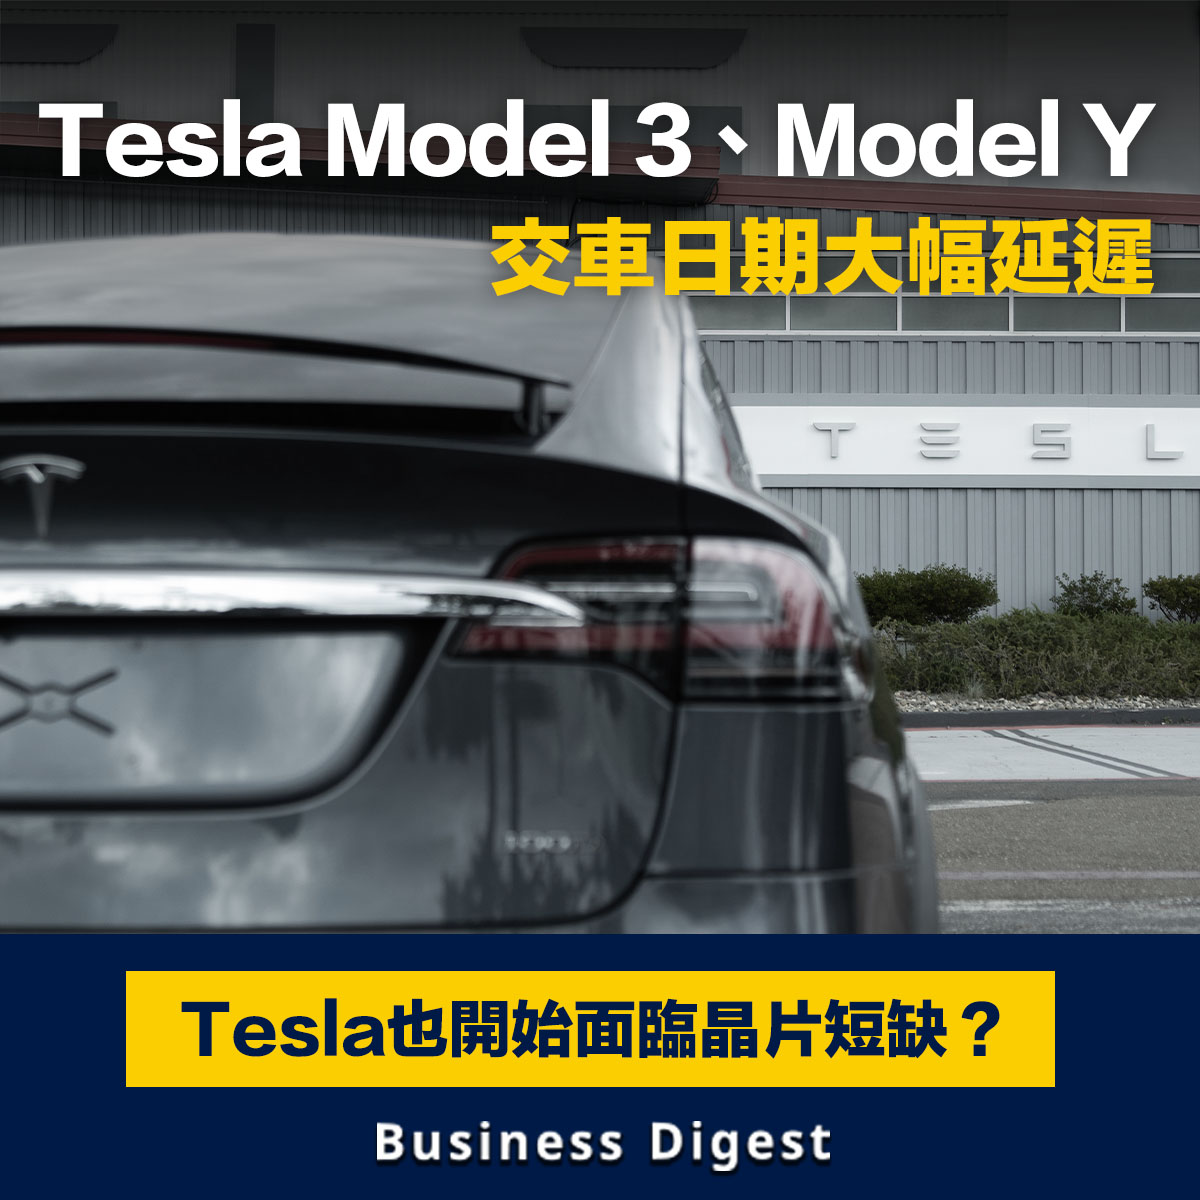 Tesla在官網上更新熱銷車型Model 3、Model Y的交車時間,延長了幾個月以上的時間。